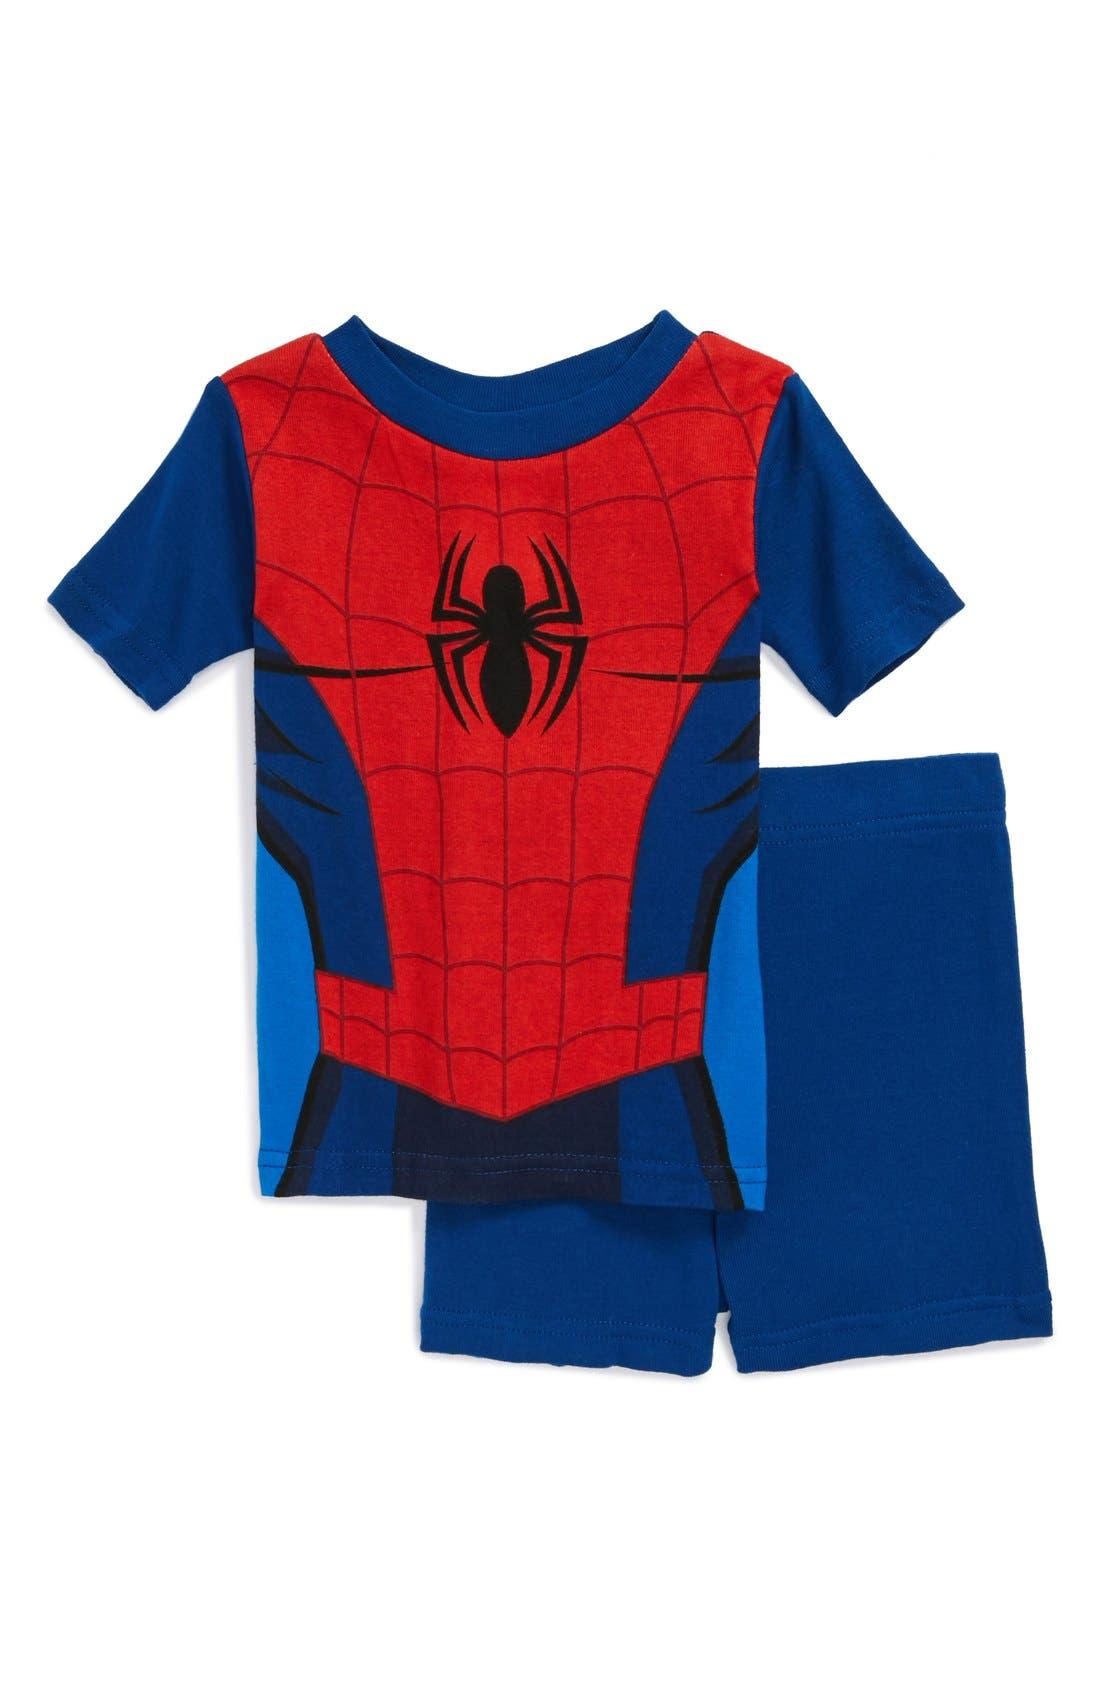 Alternate Image 1 Selected - Warner Brothers™ 'Spiderman™' Pajama Set (Toddler Boys)